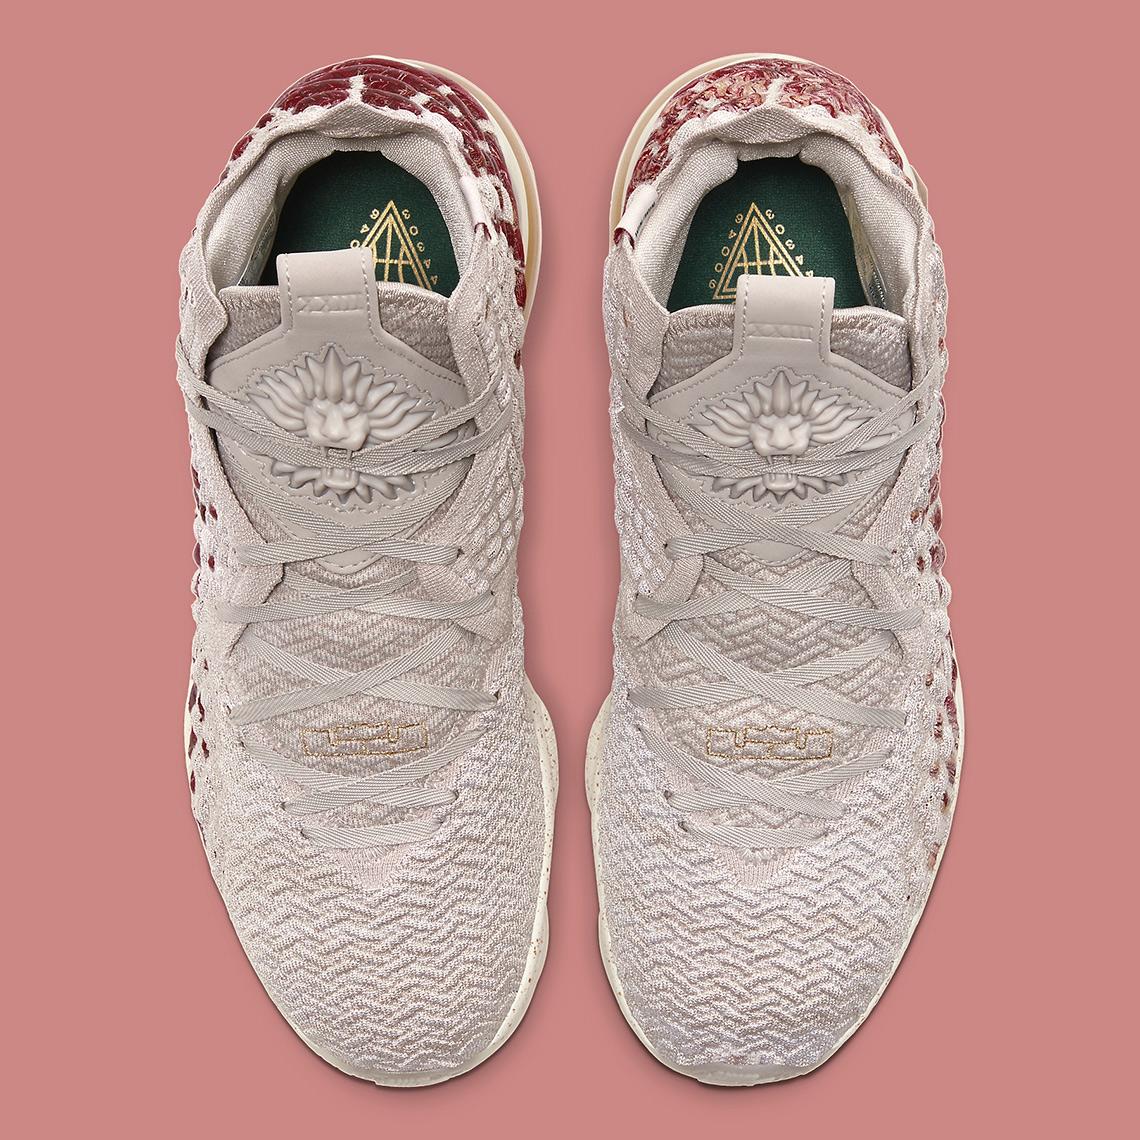 Nike LeBron 17 Win Win CT3466 001 Store List |